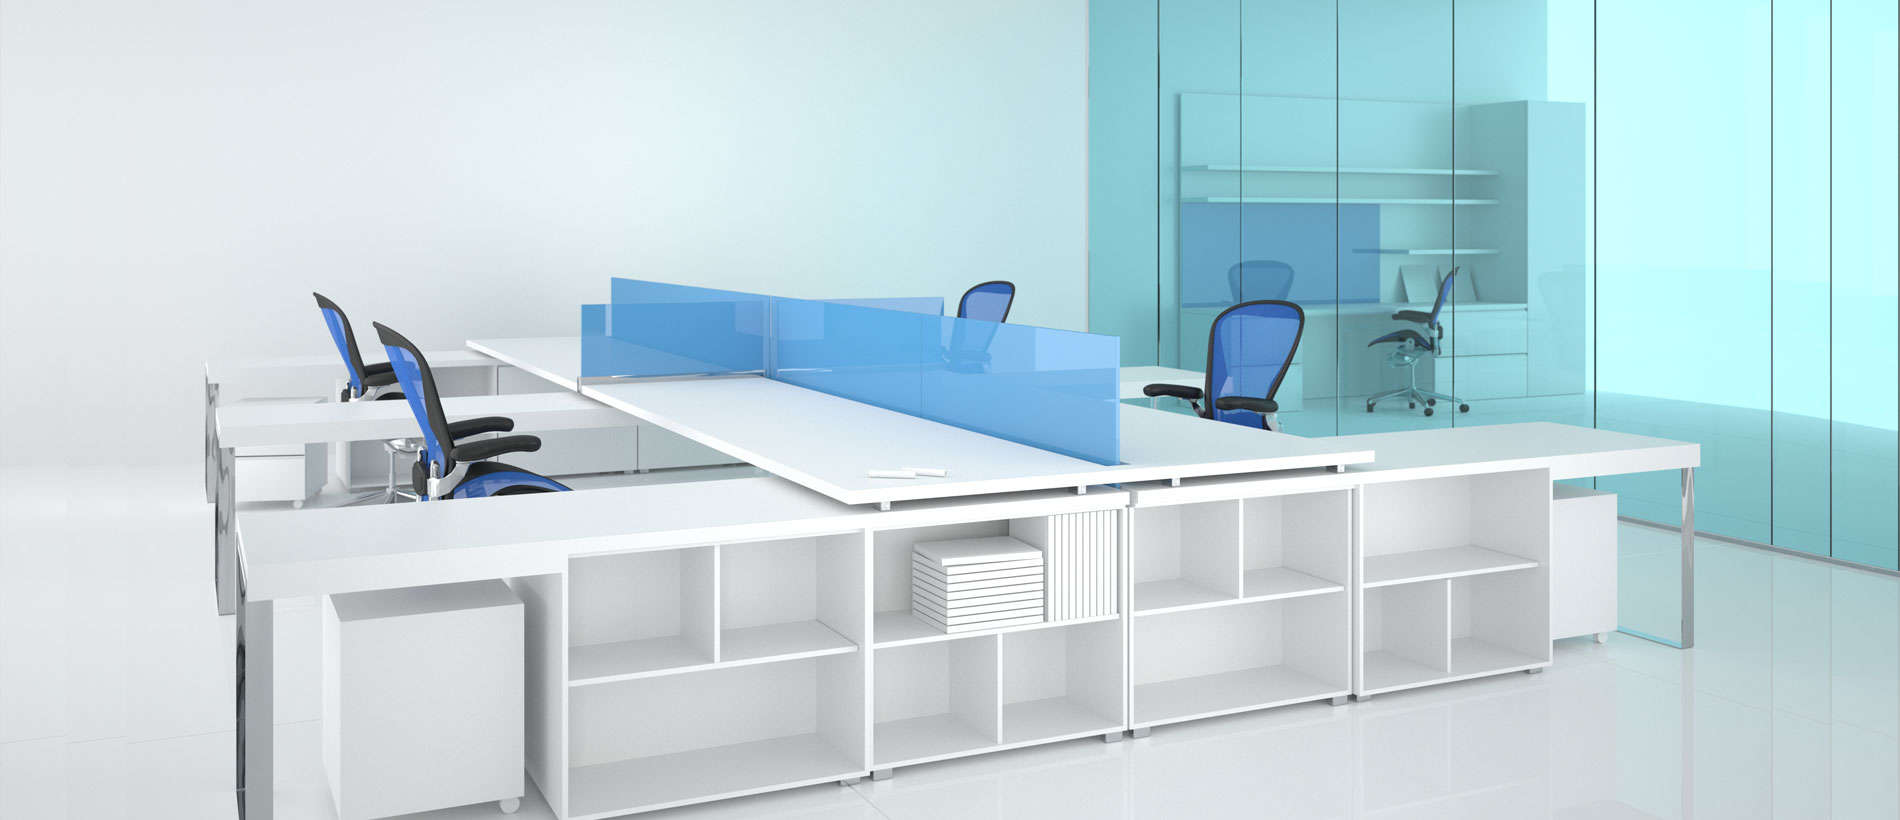 furniture-head-image.jpg